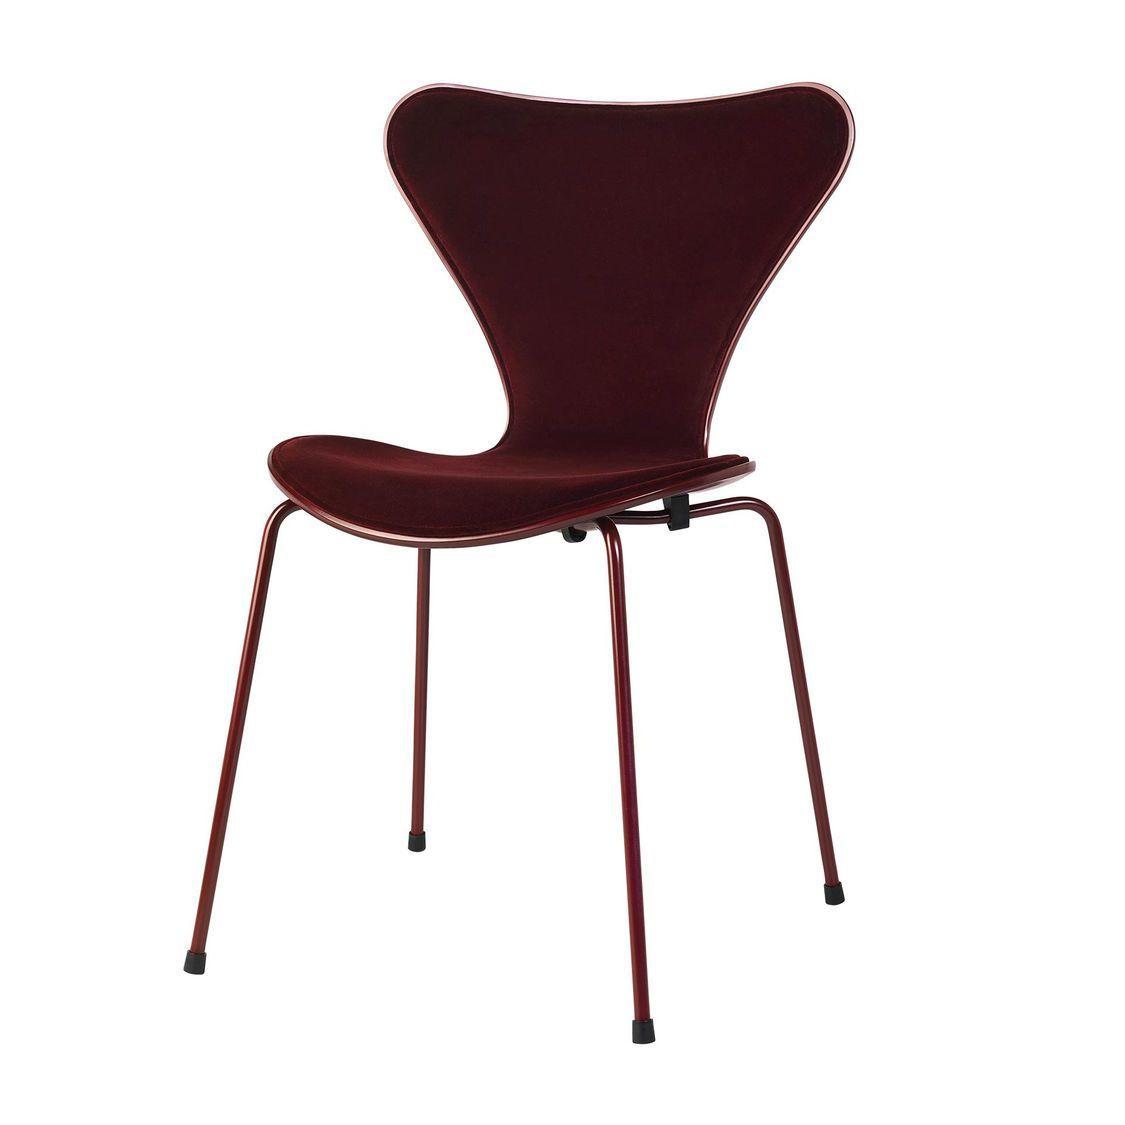 Limited Edition Series 7 Chair Velvet Fritz Hansen